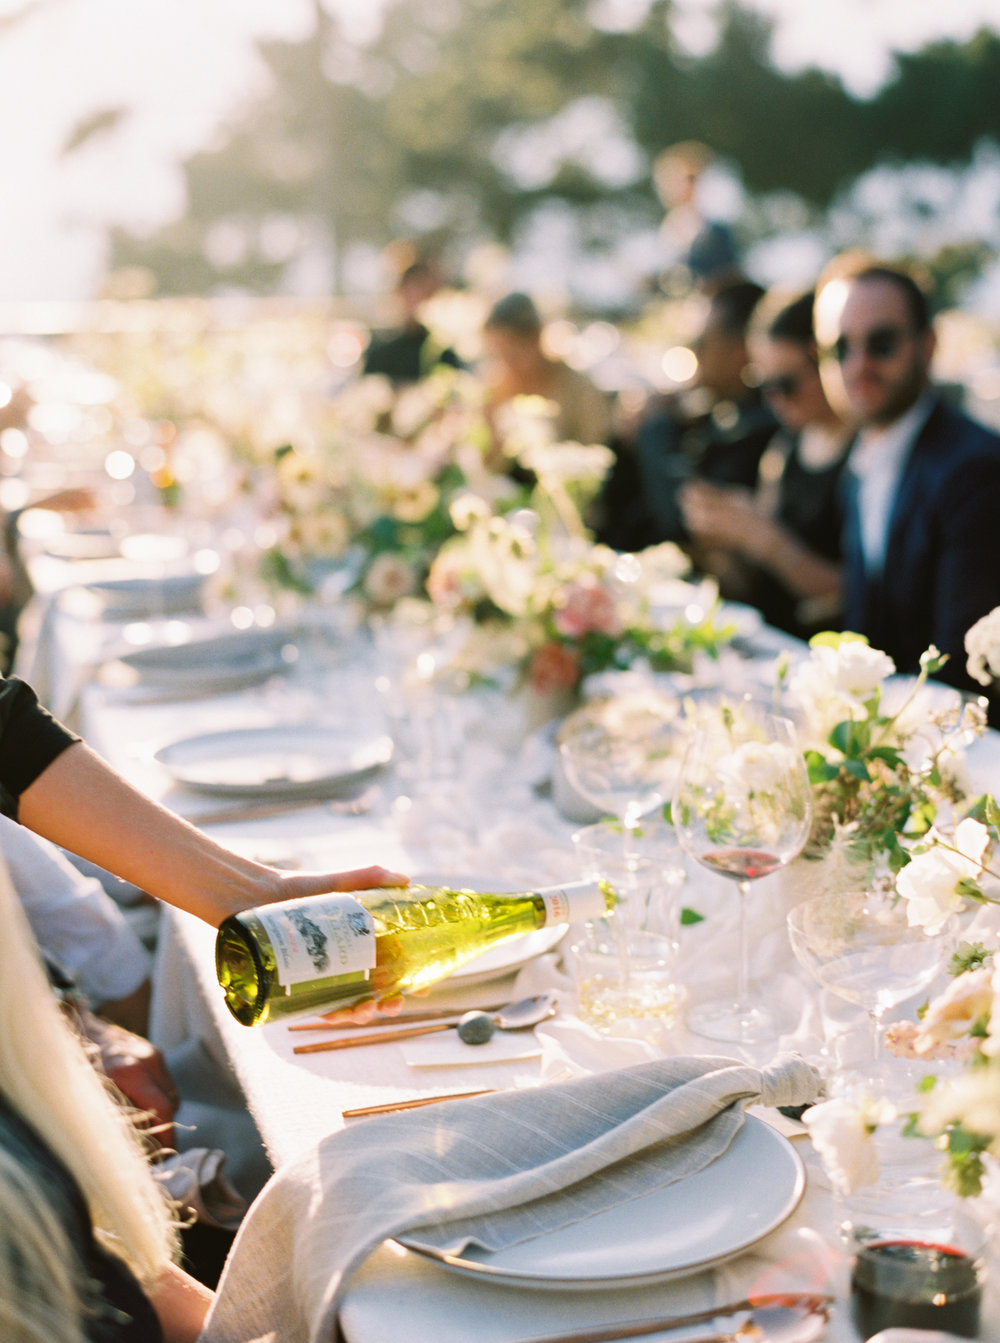 12th-Table-BIG-SUR-WEDDING-Erich-McVey-18